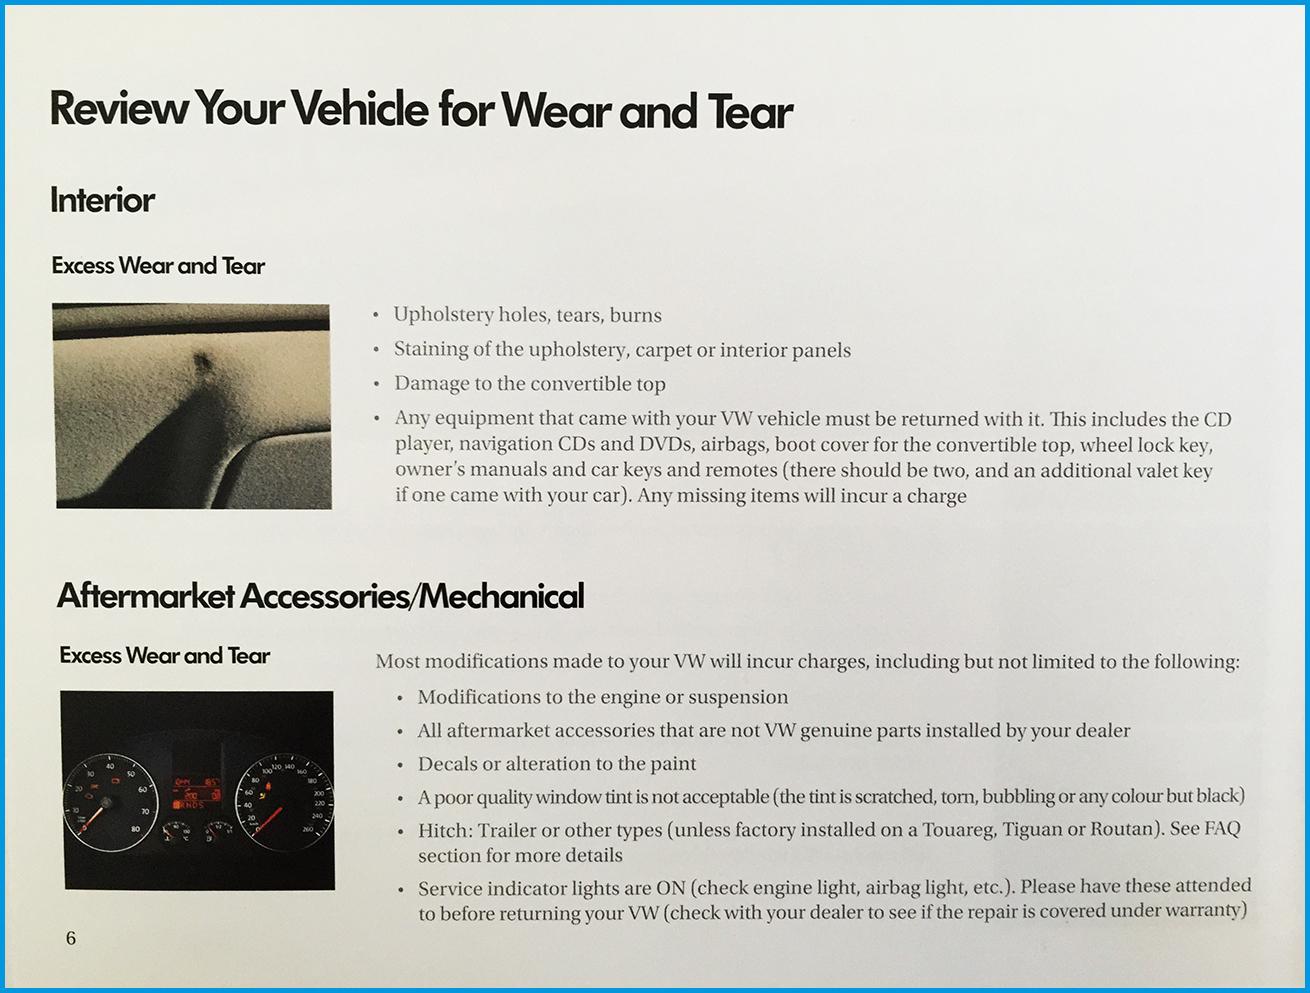 volkswagen wear and tear guidelines Brantford